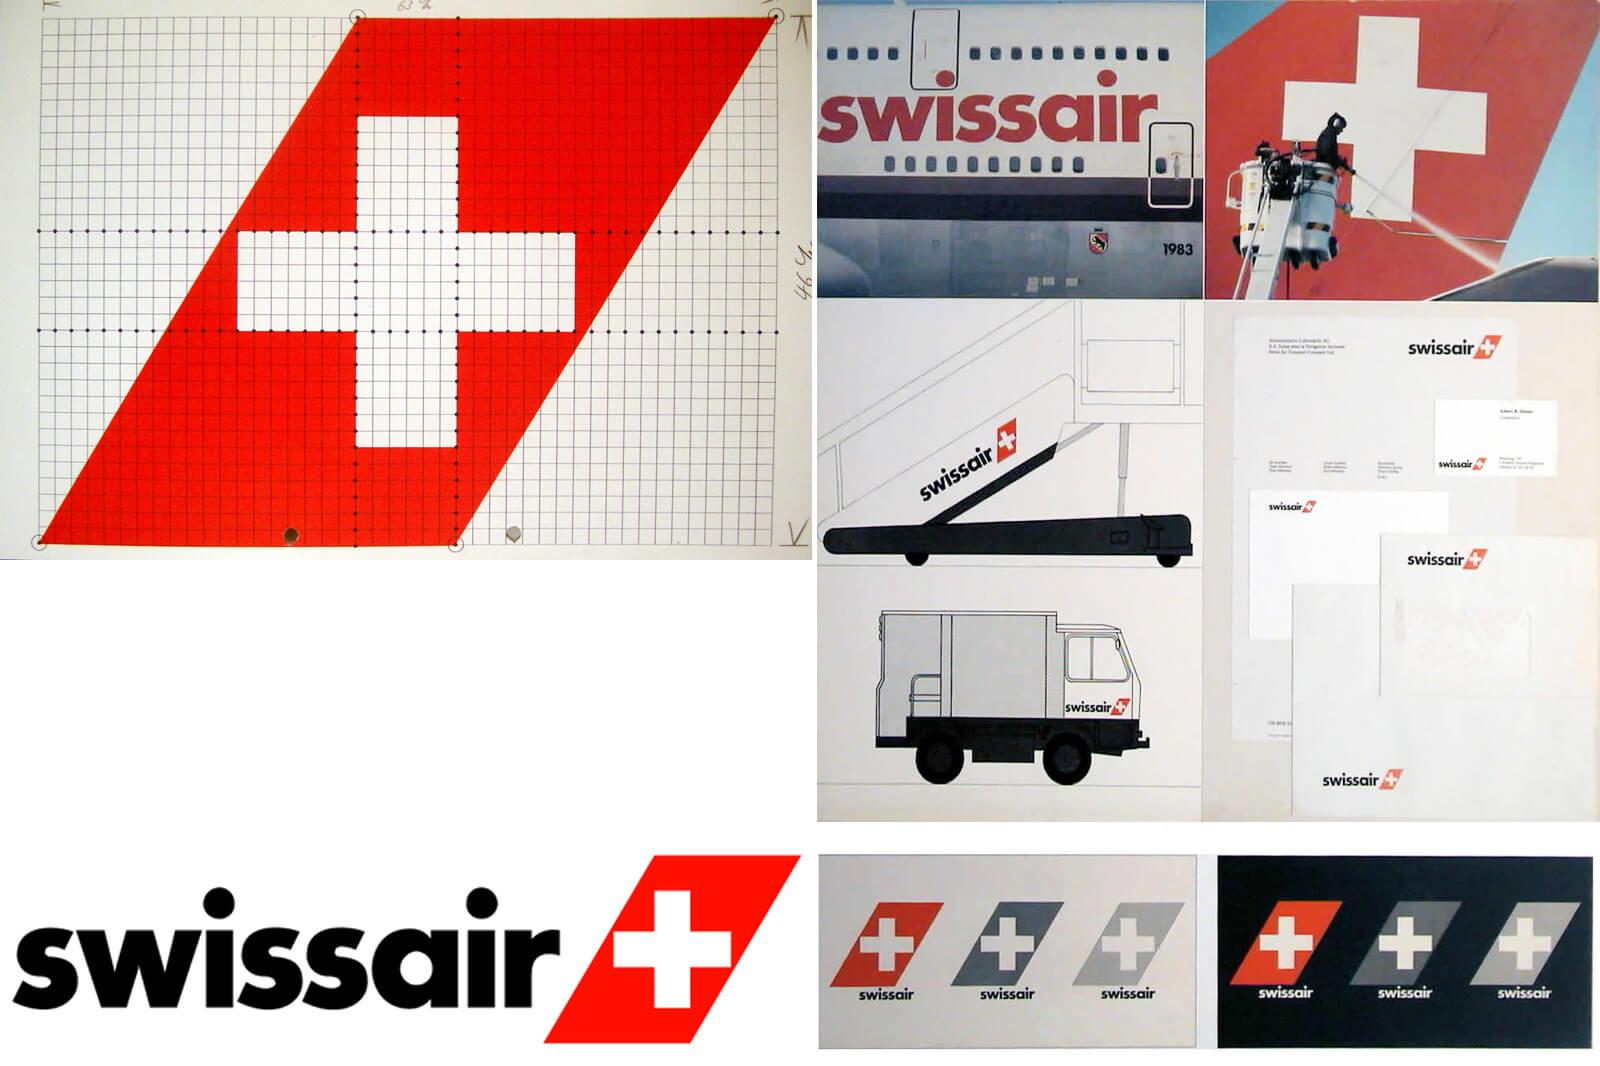 Swissair Posters and Logos - 1980s Swissair Logo